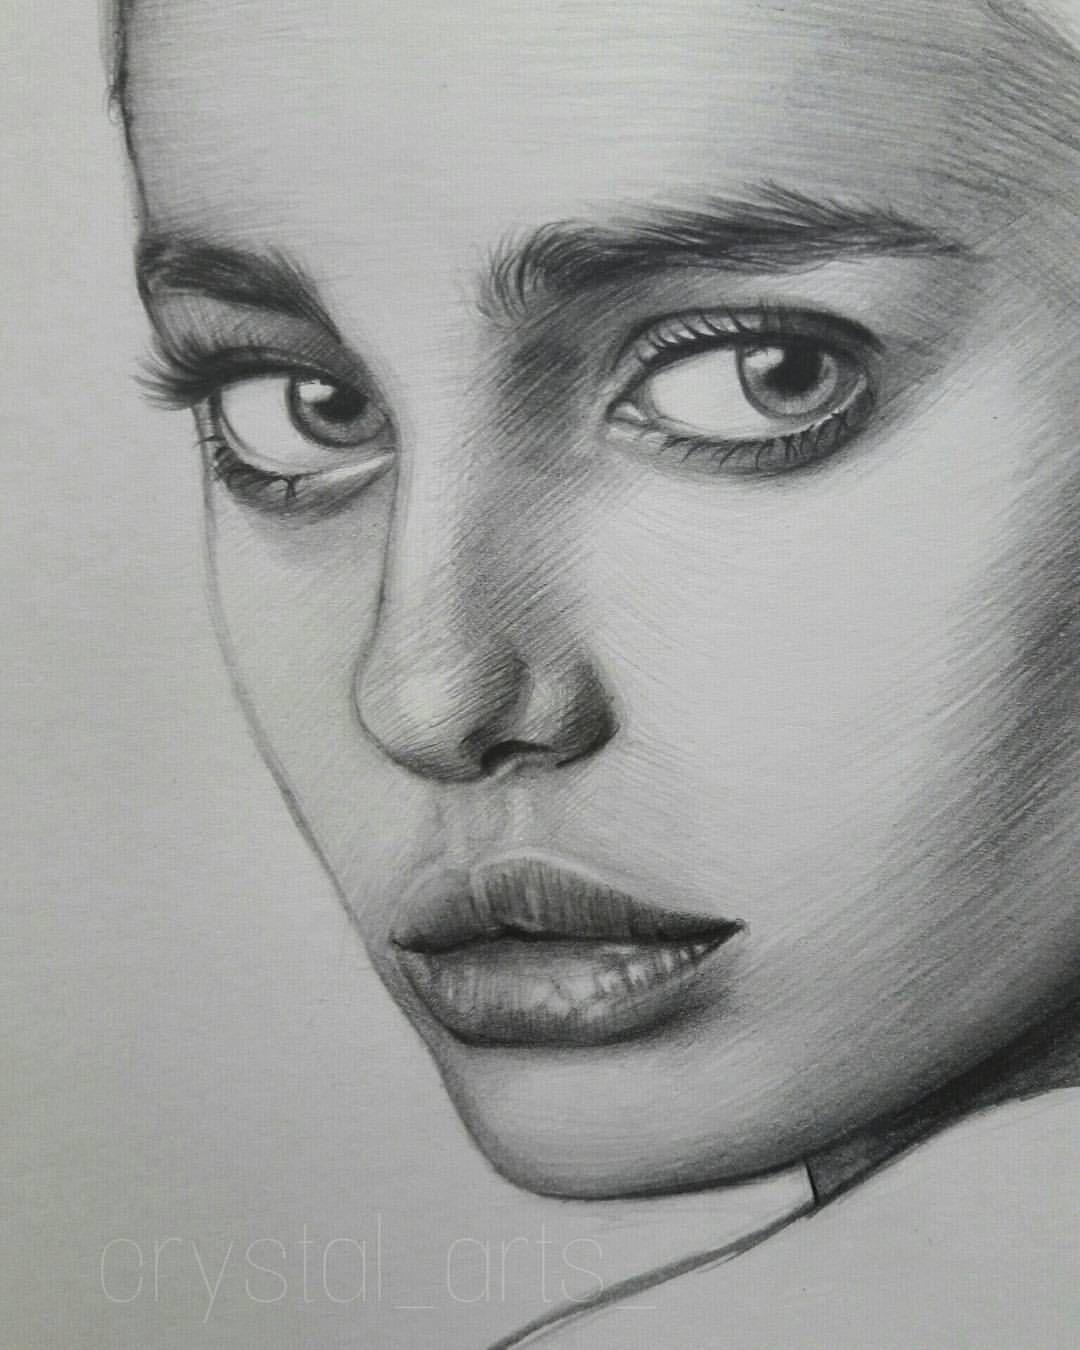 #sketch #sketchbook #pencil #portrait #art #arts #